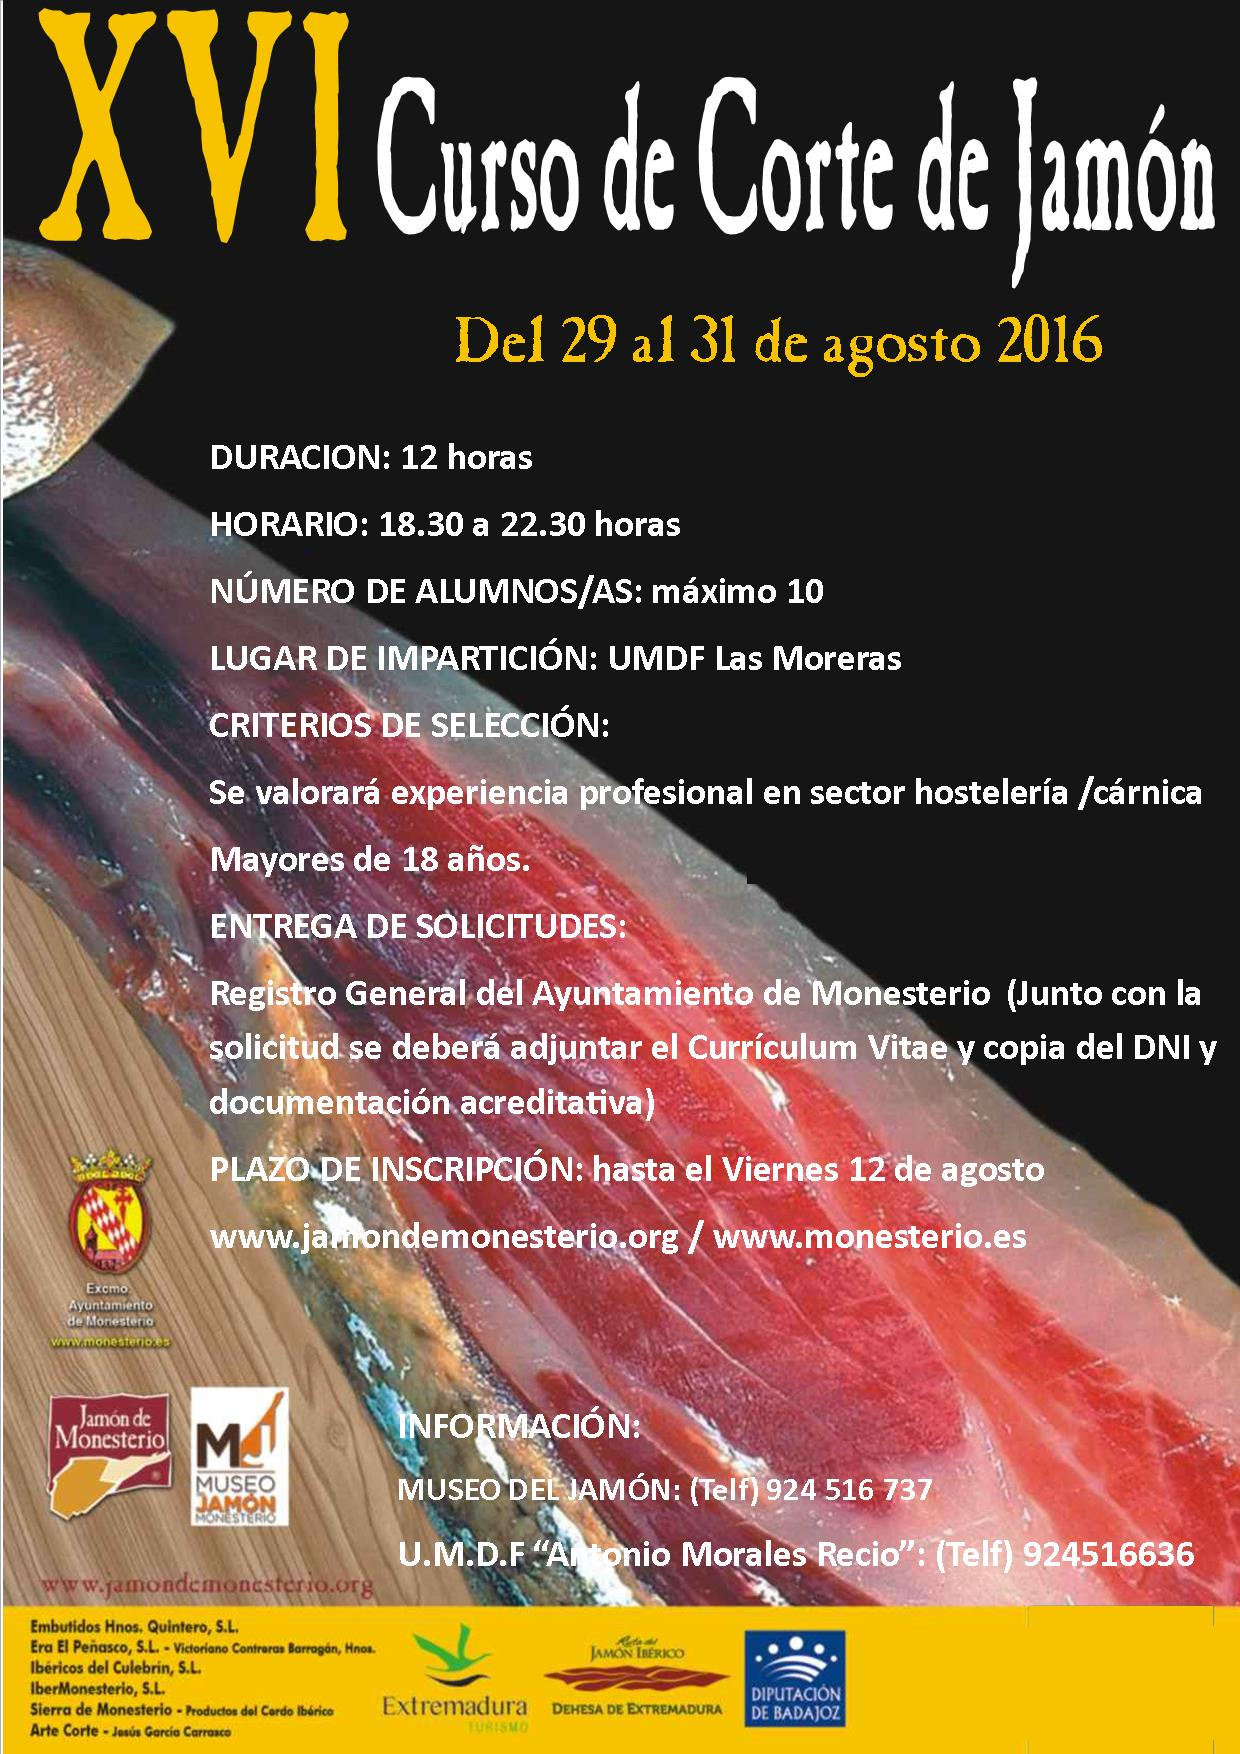 CURSO CORTE DE JAMON 2016